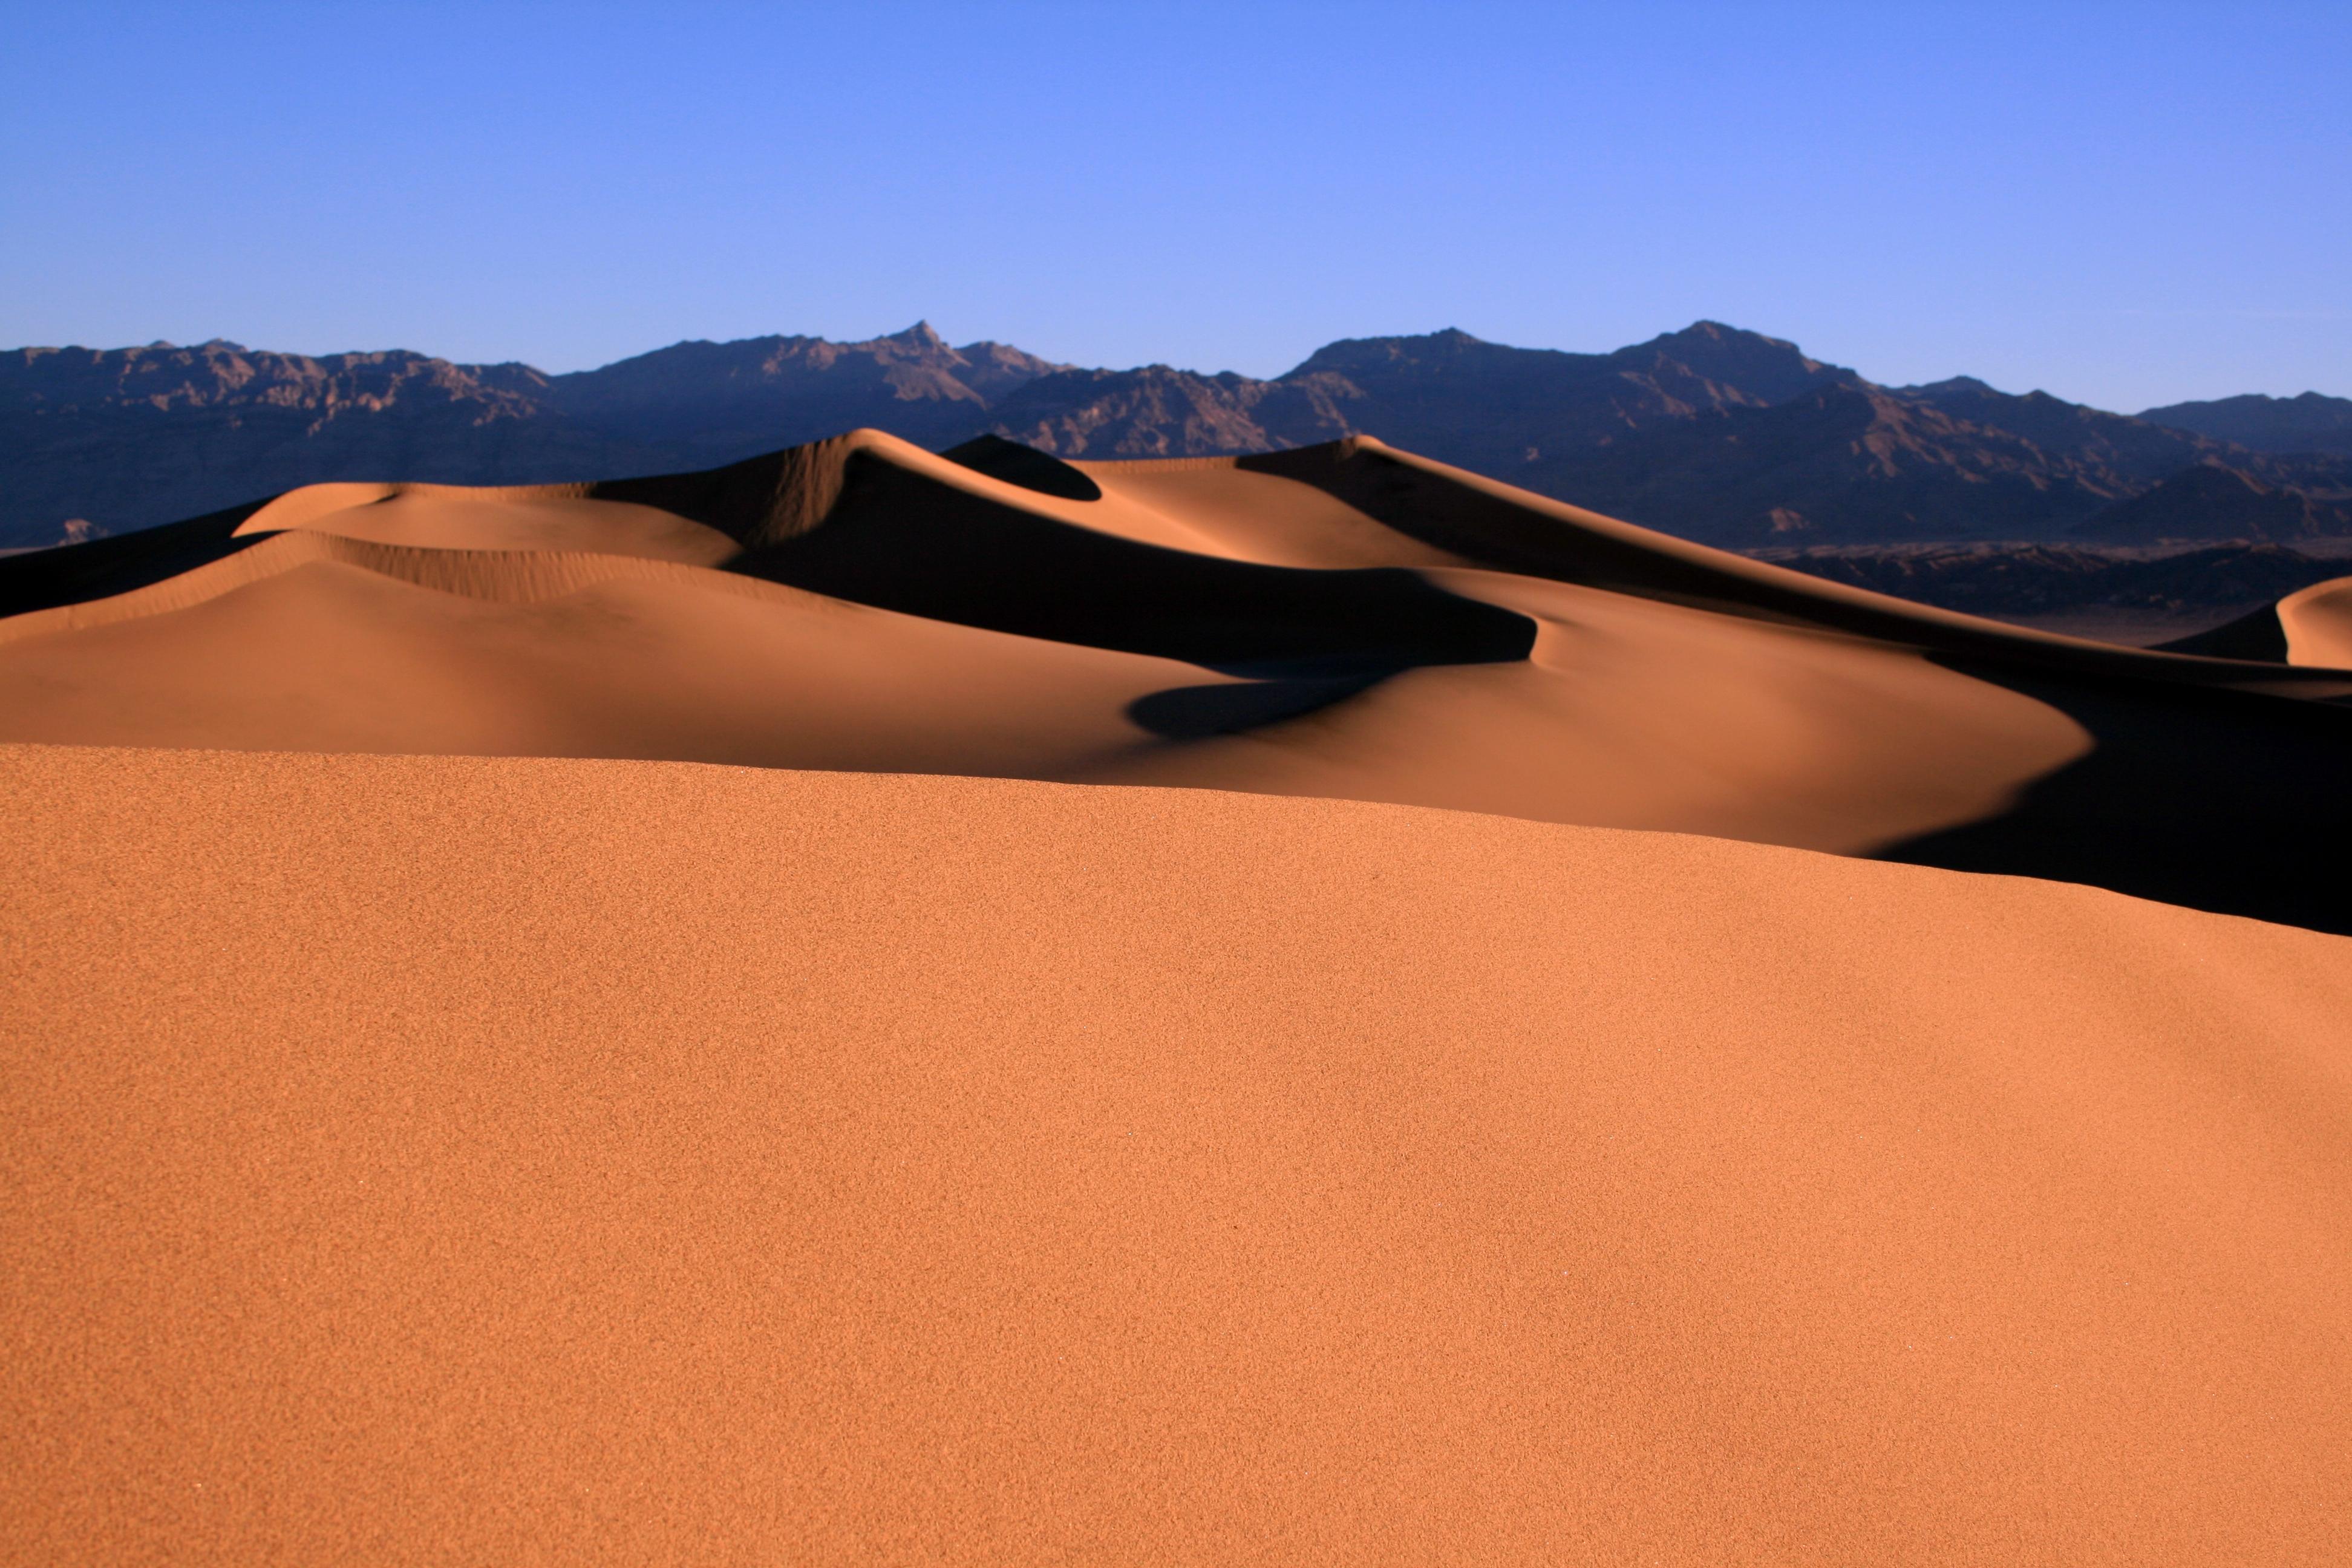 Sand Dunes File:Sand dunes death ...